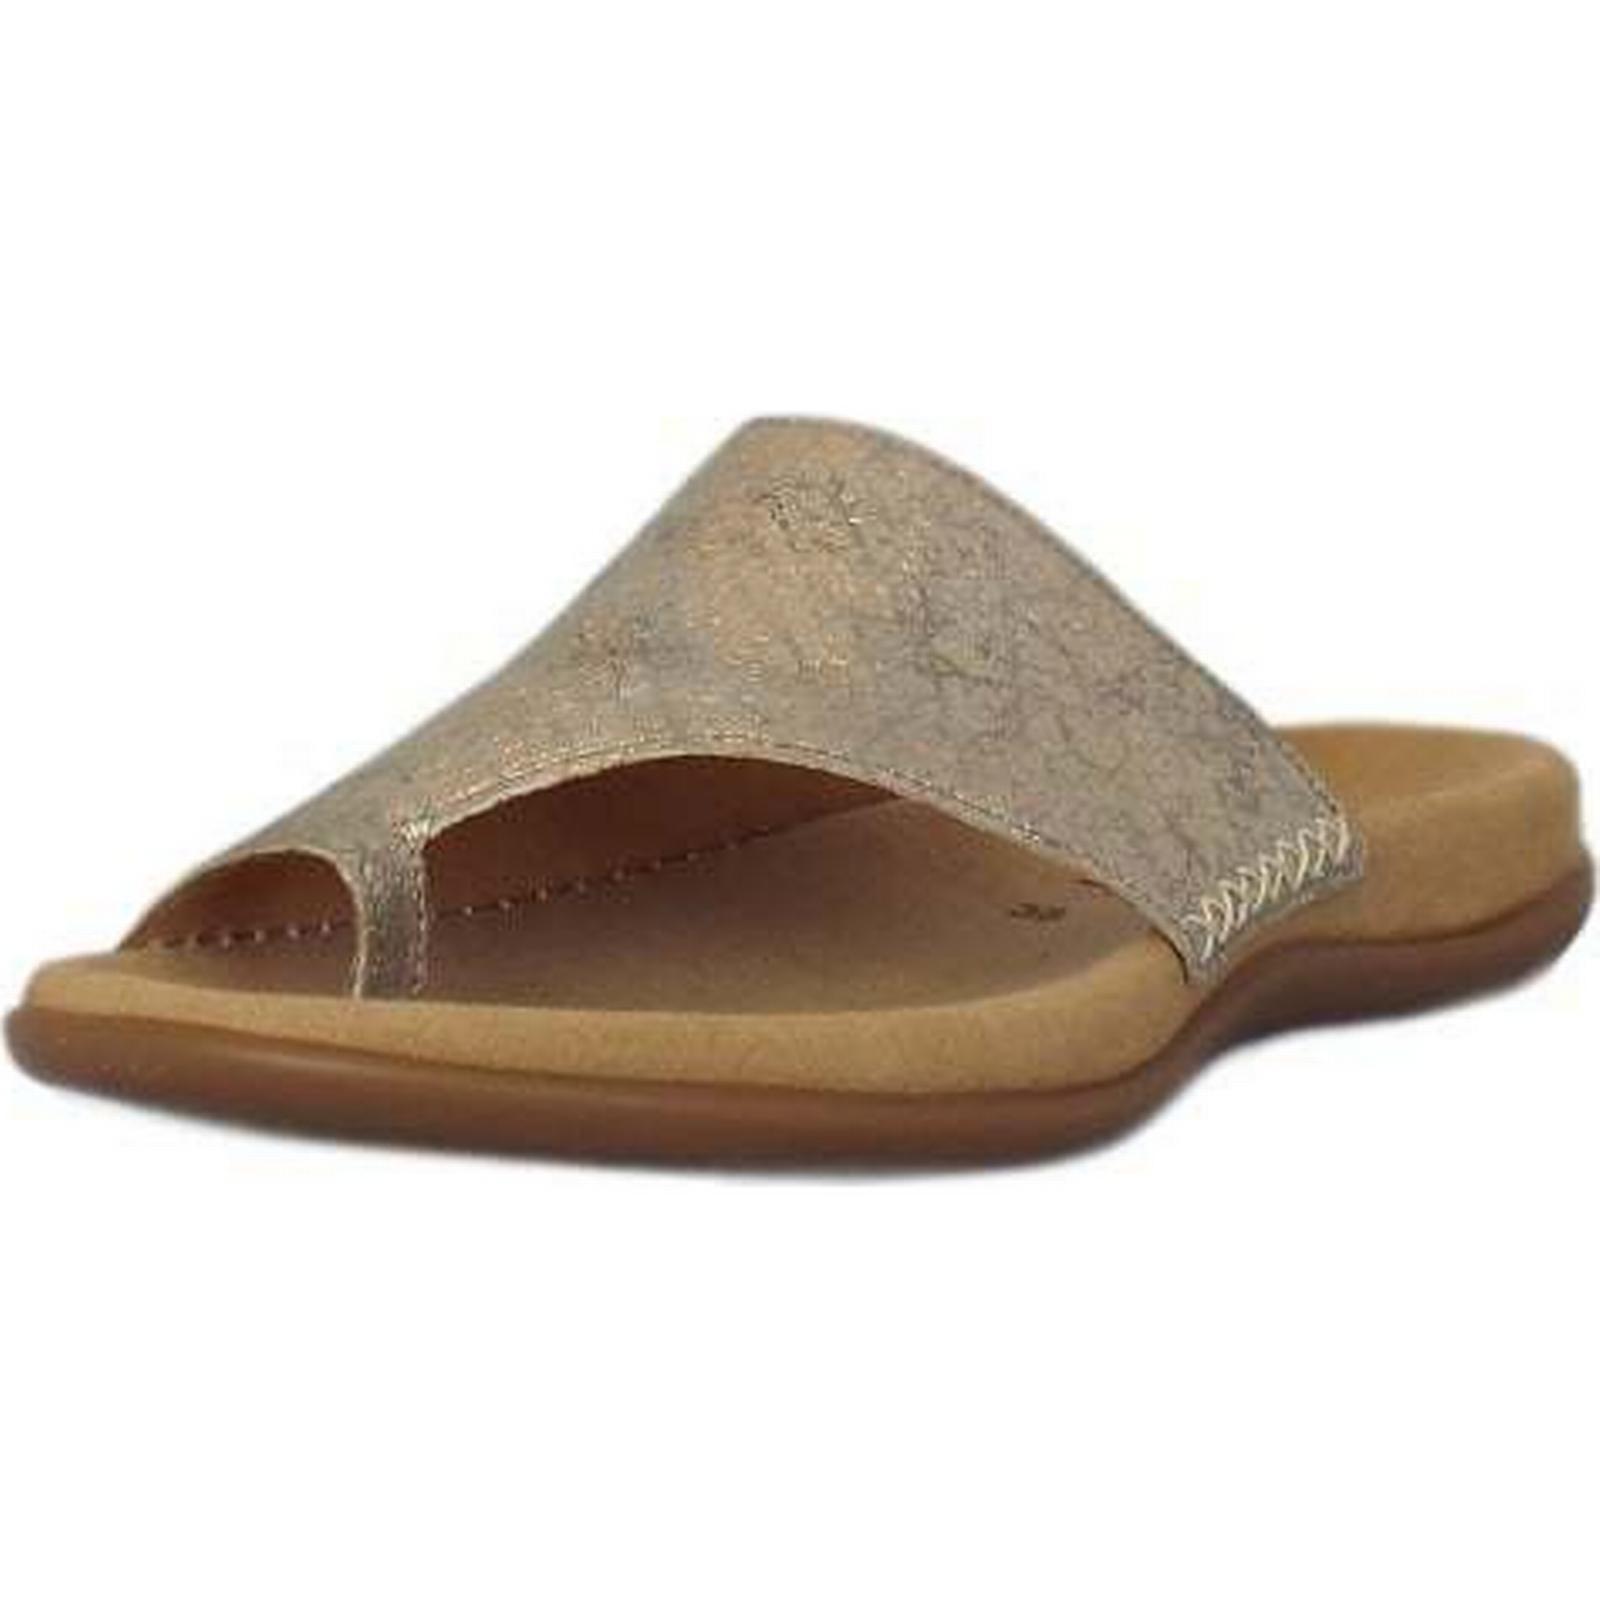 gabor lanzarote gabor gabor gabor mesdames summer sandales taille: 35 2d6bd1